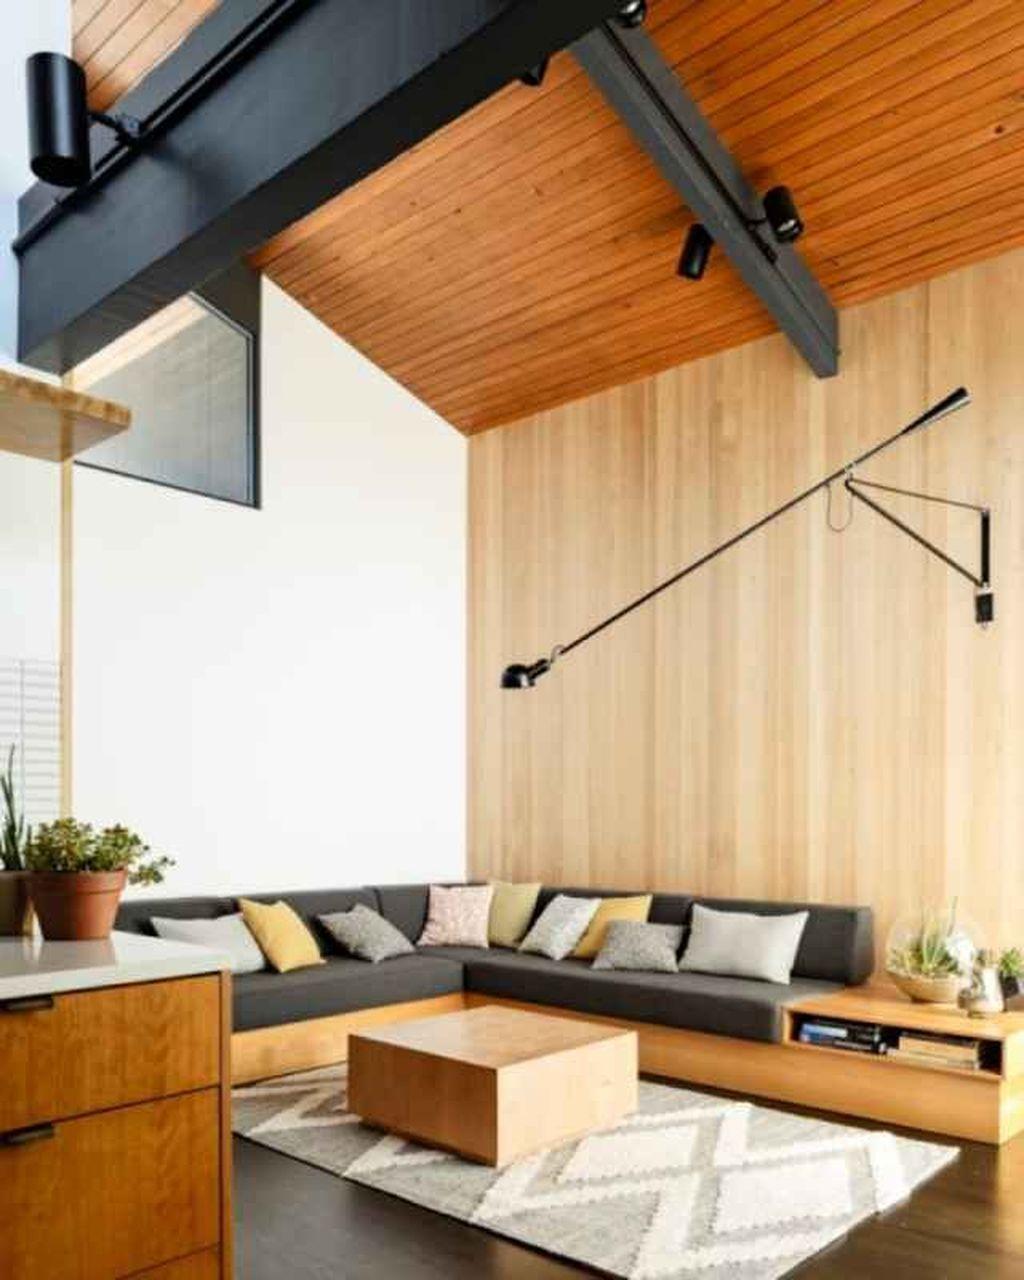 Inspiring Modern Home Furnishings Design Ideas 18